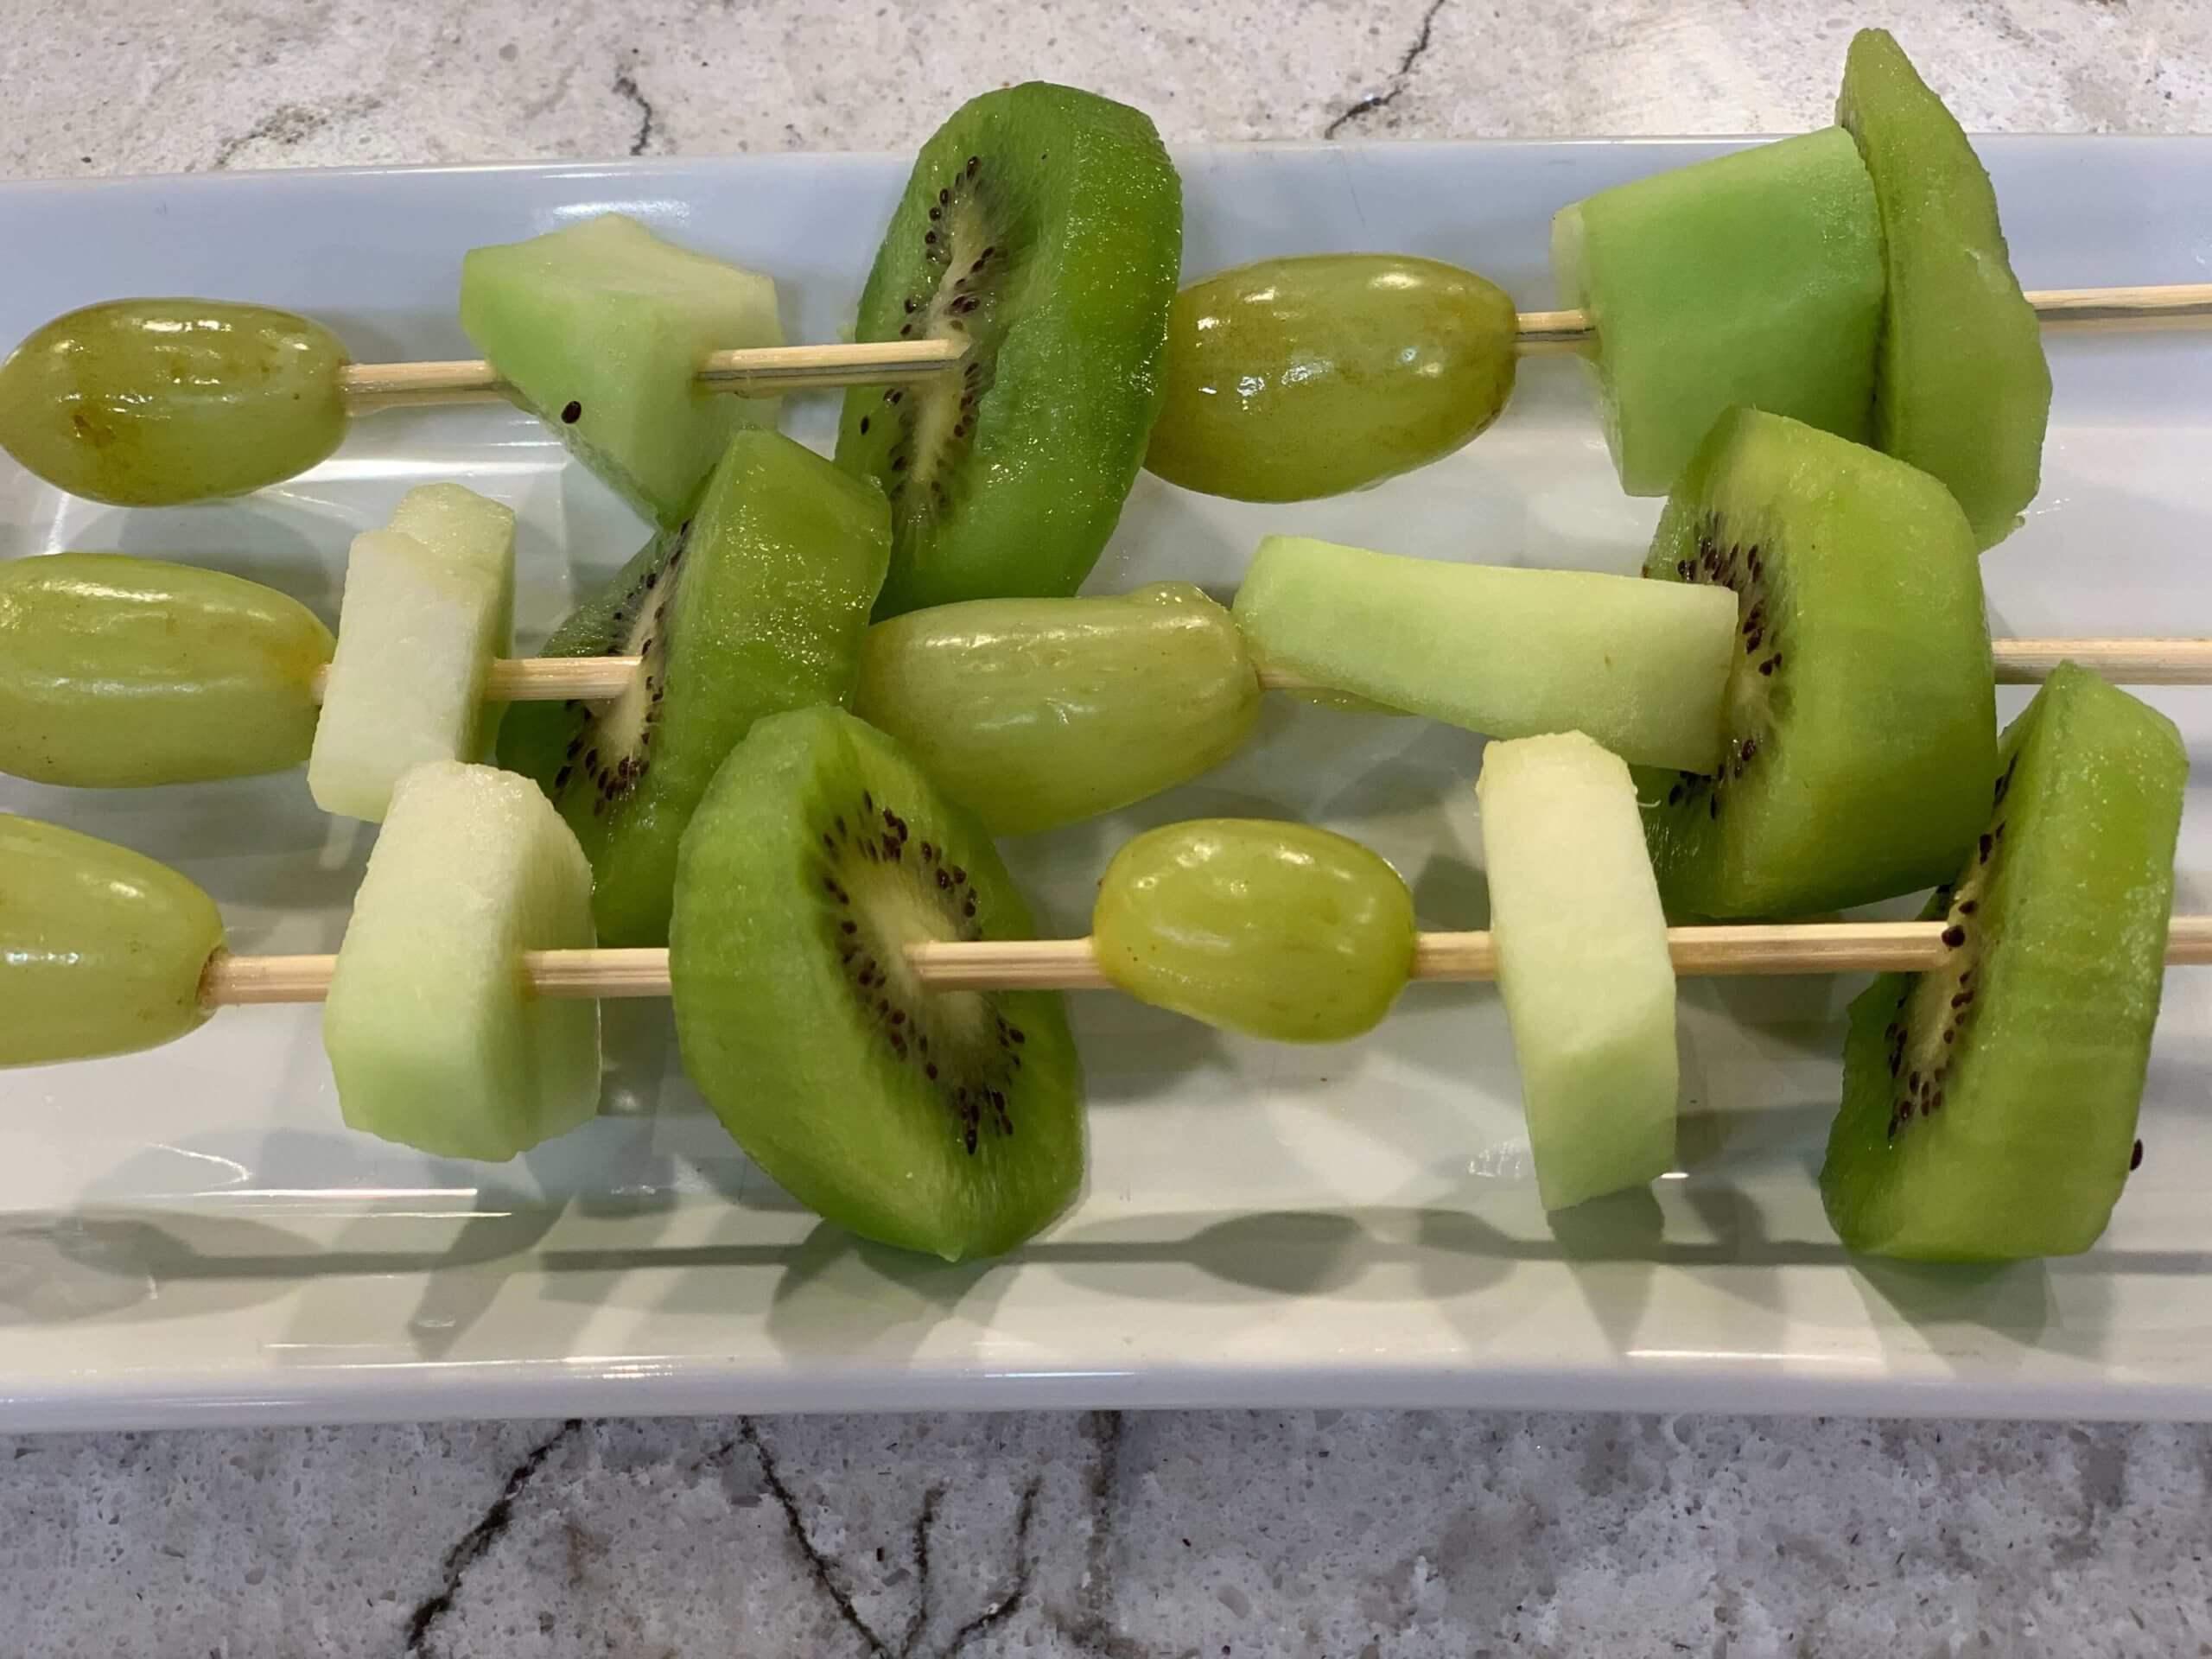 Shamrock Kabobs using Green Fruits